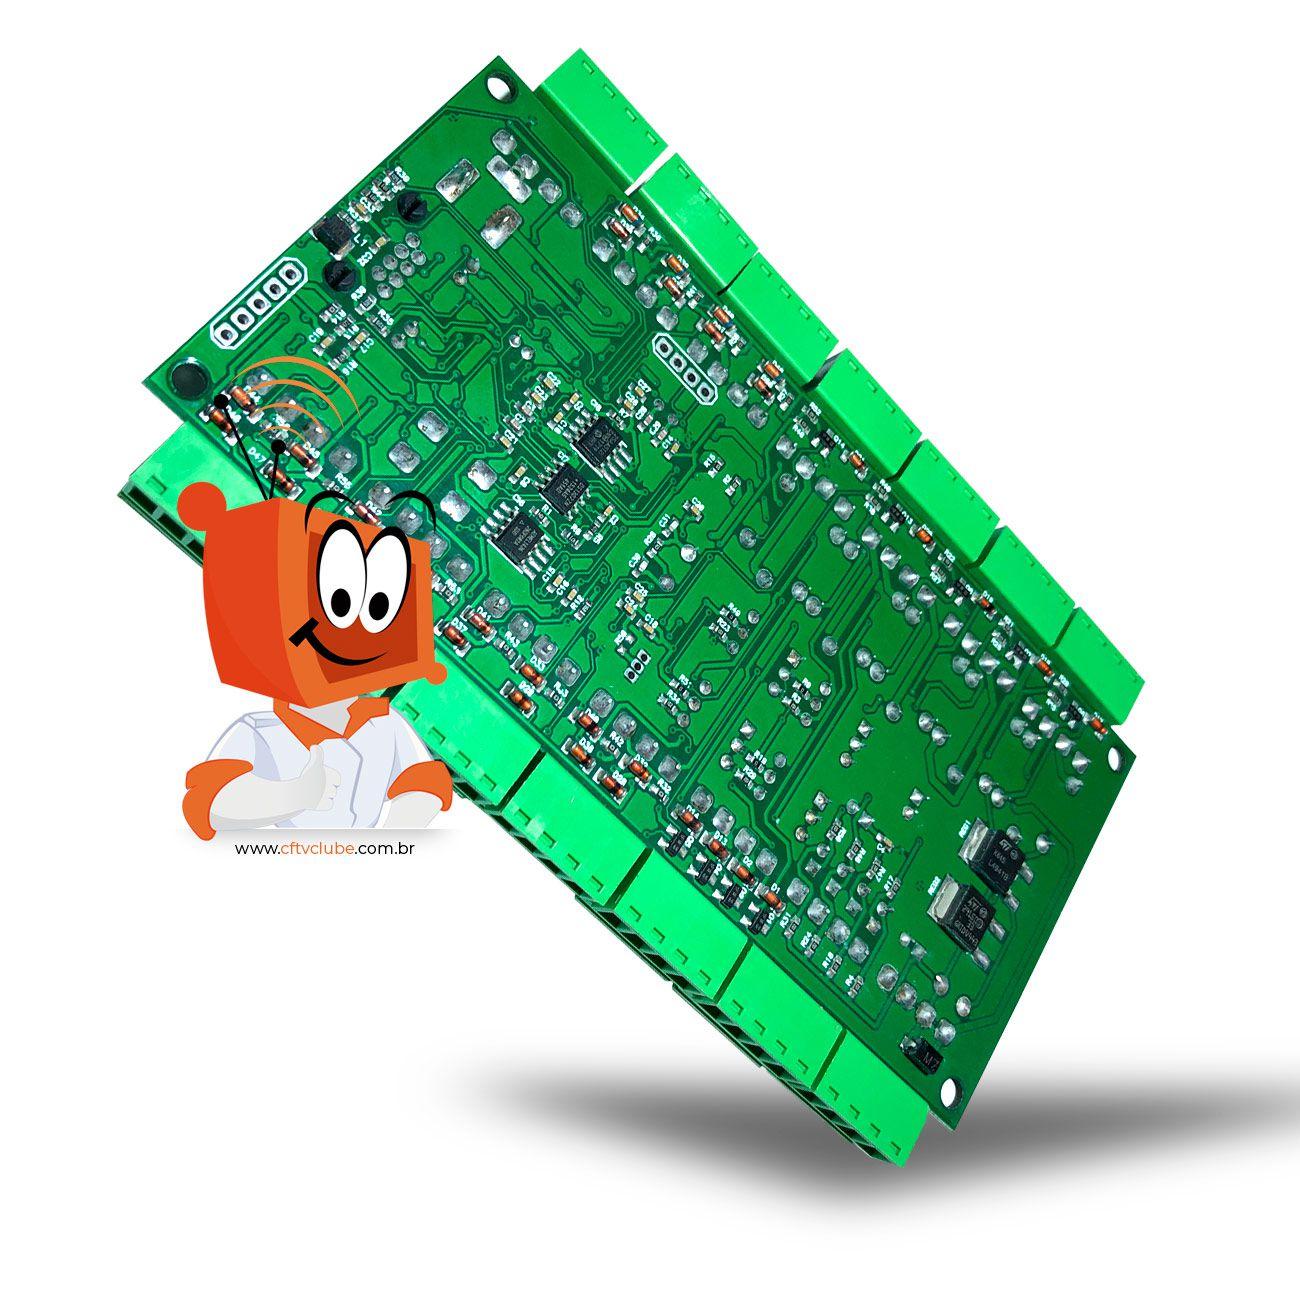 Controladora IP-Wide 4 Pontos - CX-7006 Citrox  - CFTV Clube | Brasil